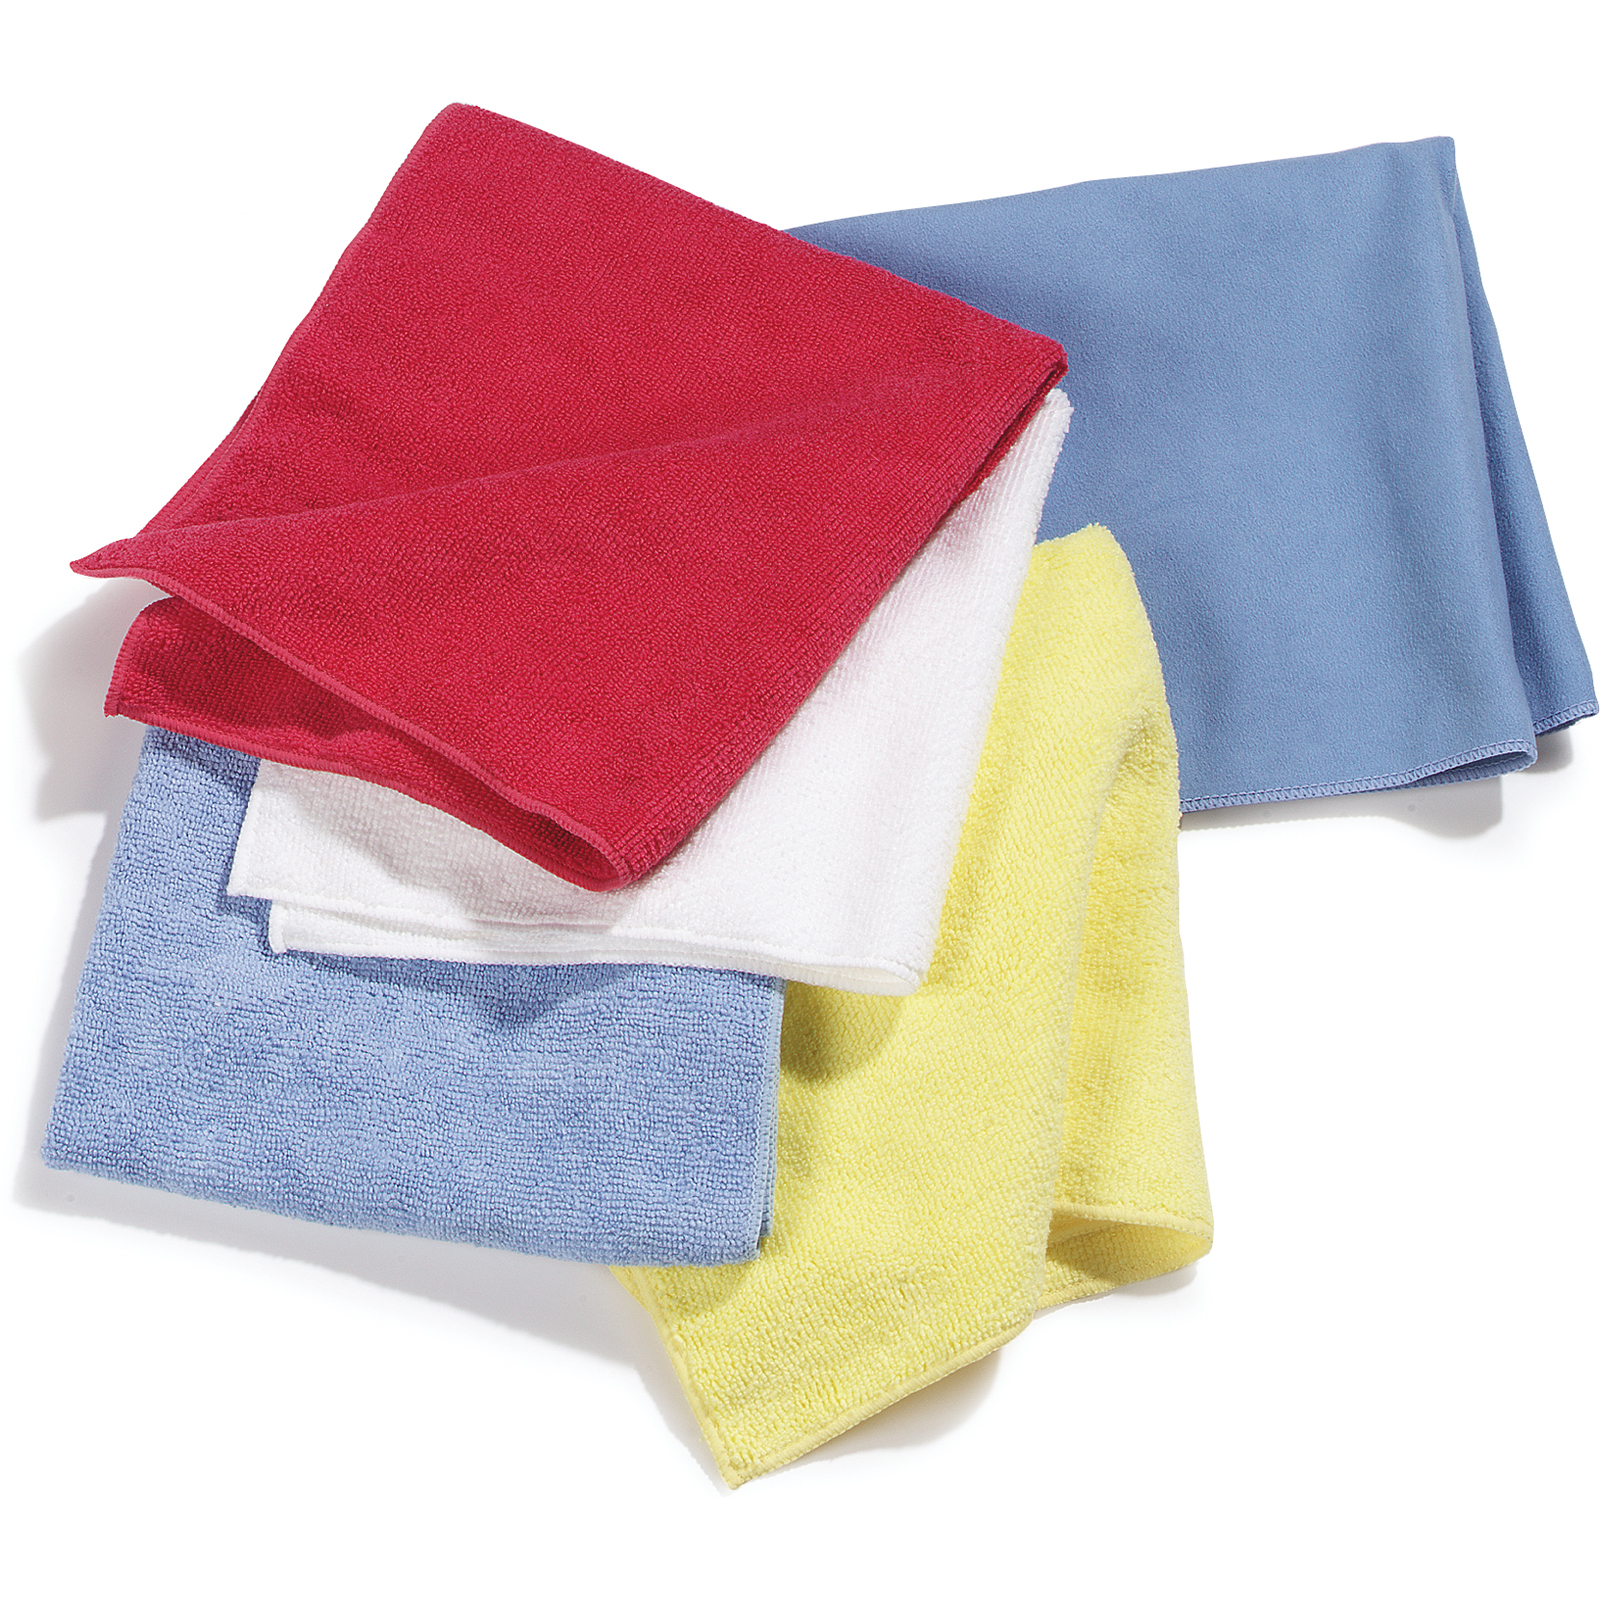 Carlisle 3633402 towel / cloth / mitts, microfiber